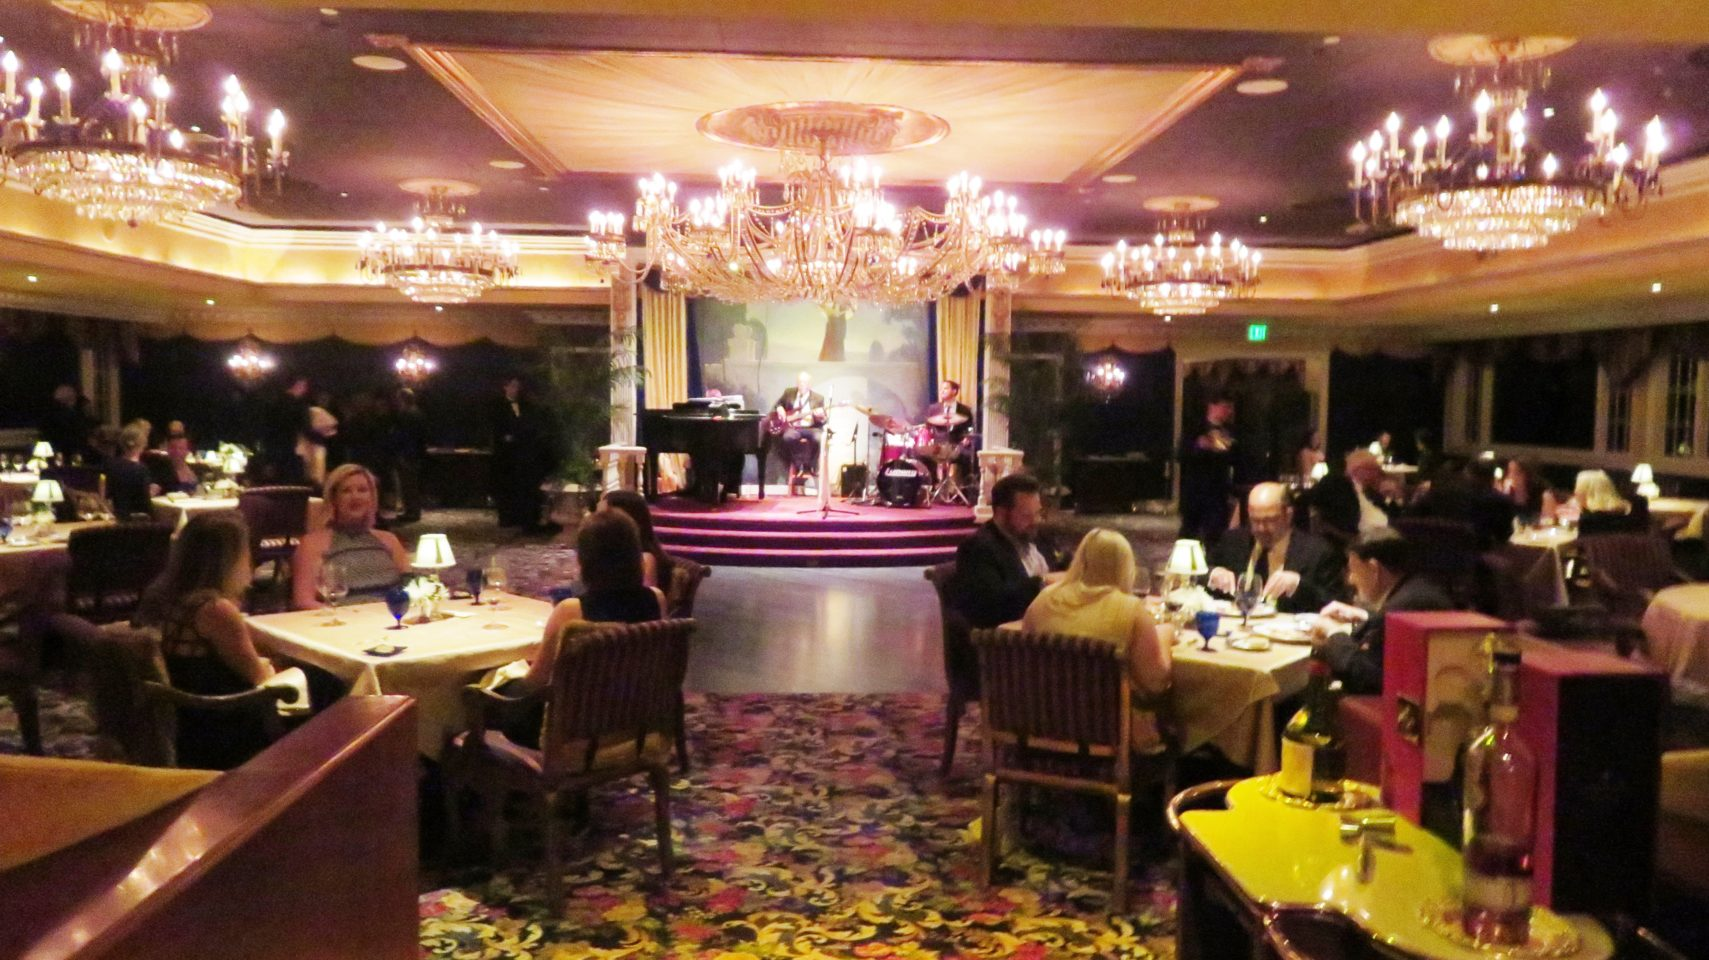 The Penrose Room restaurant at The Broadmoor Resort